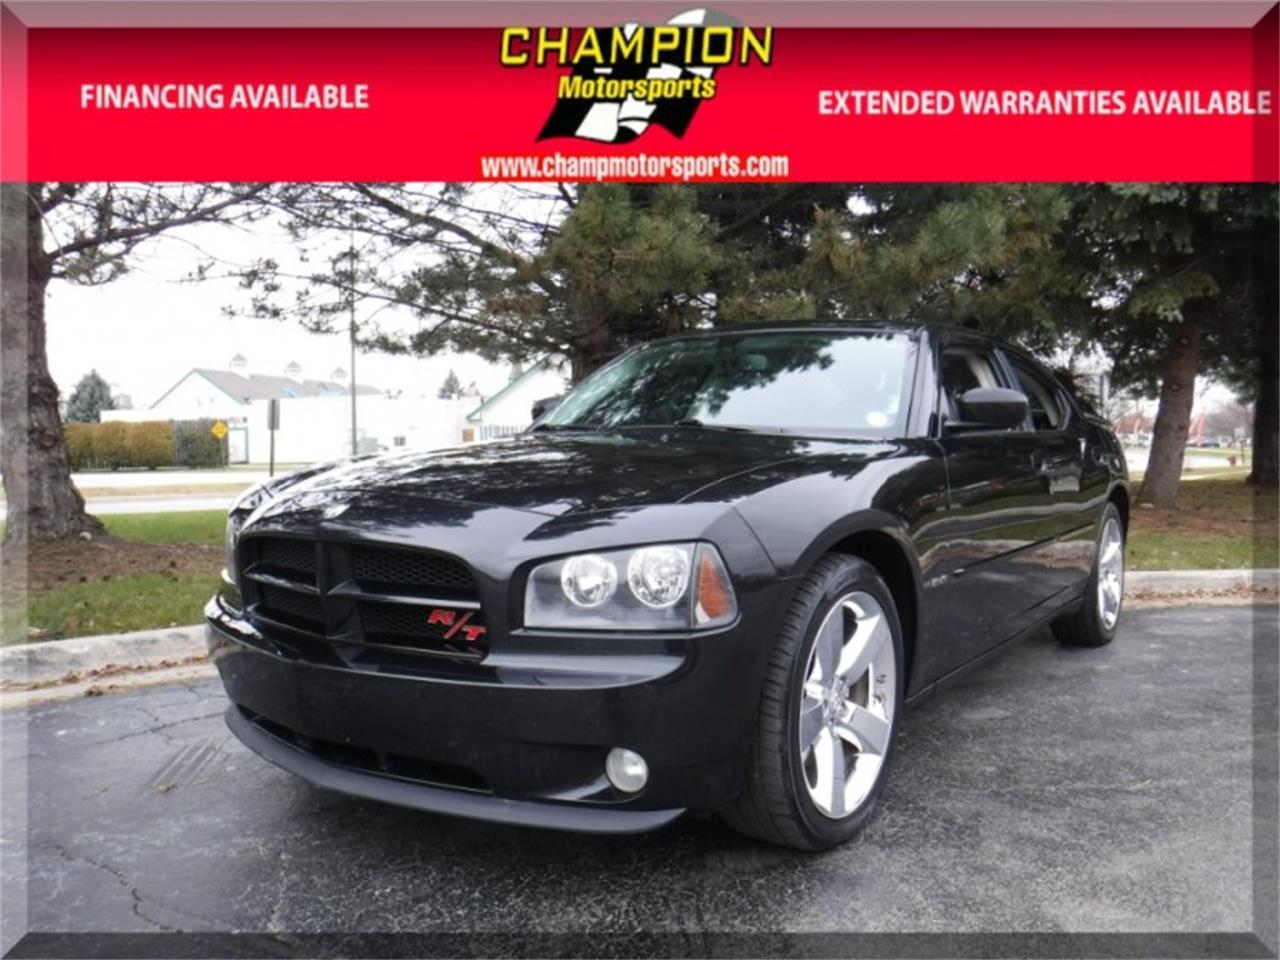 2008 Dodge Charger For Sale >> For Sale 2008 Dodge Charger In Crestwood Illinois